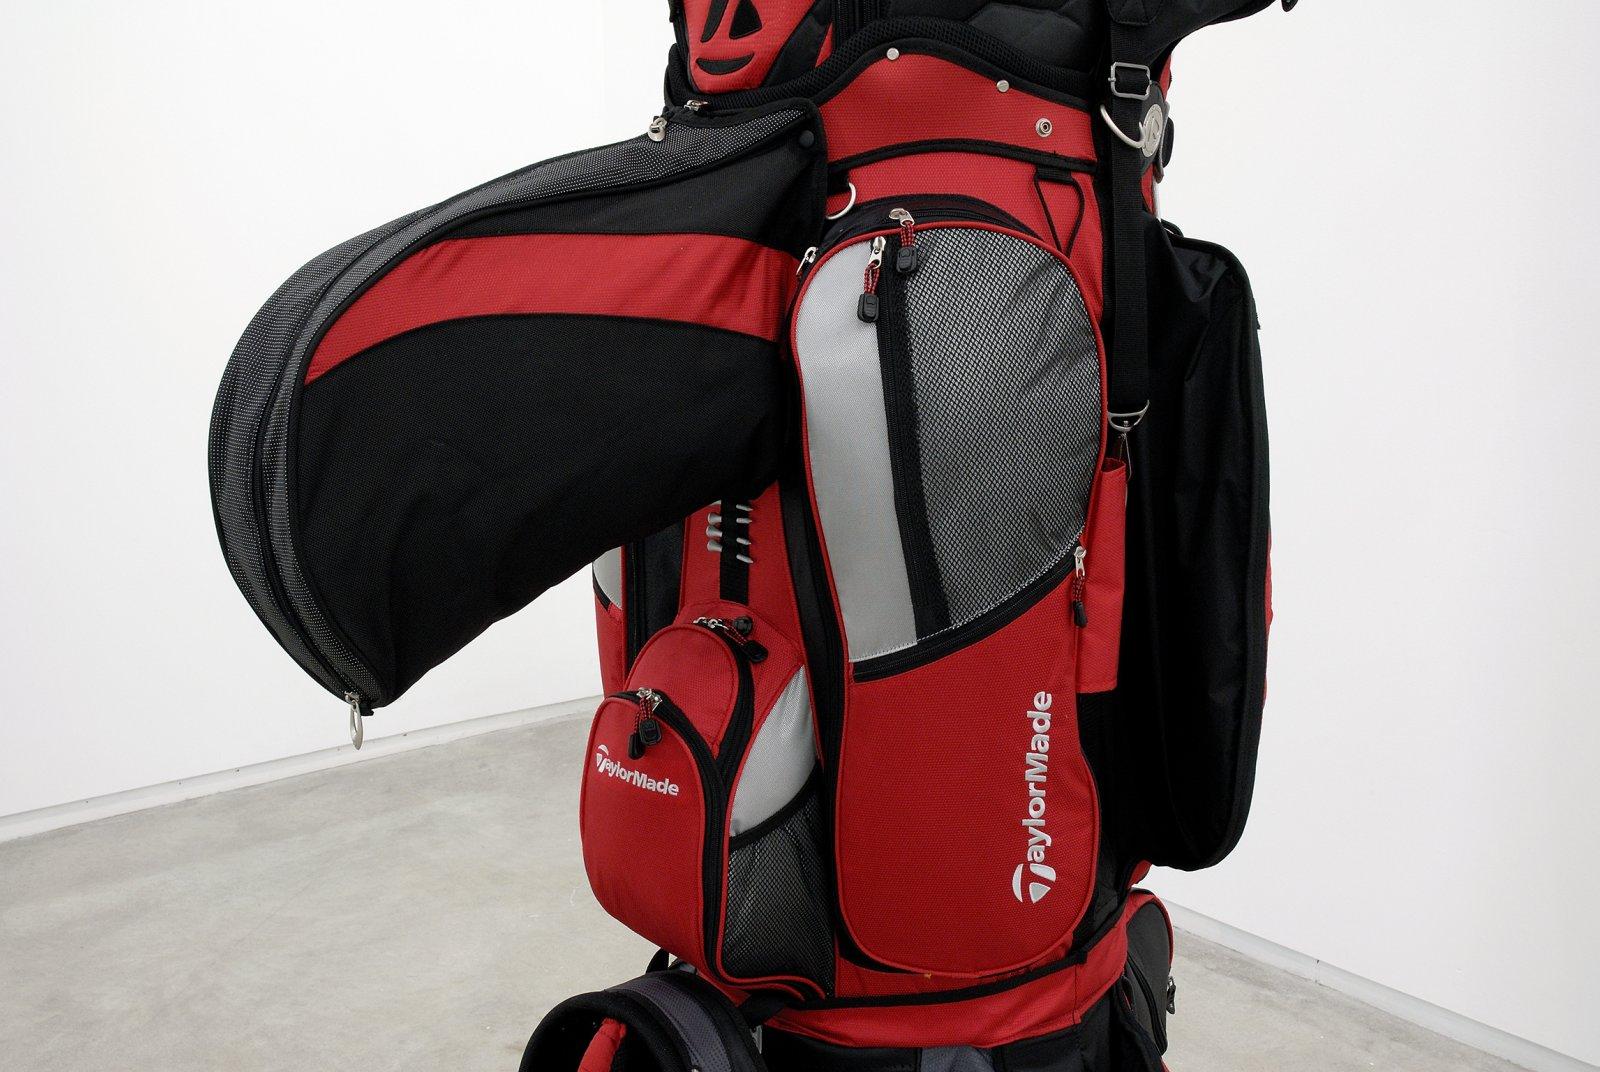 Brian Jungen, 2000 (detail), 2007, golf bags, cardboard tube, 146 x 30 x 38 in. (371 x 76 x 97 cm) by Brian Jungen